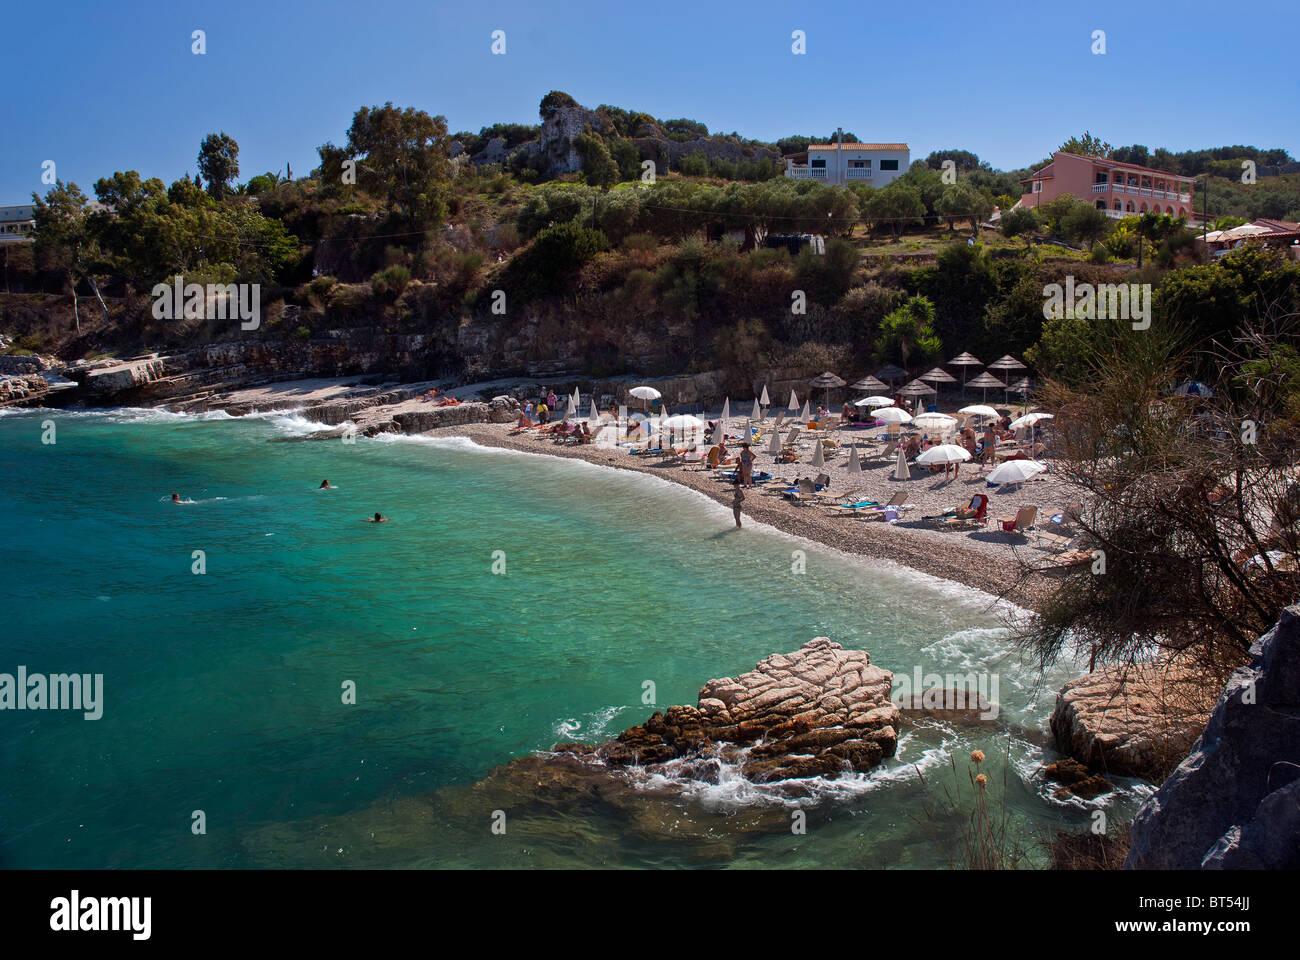 Kassiopi Beach, Corfu, Ionian Islands Greece. - Stock Image